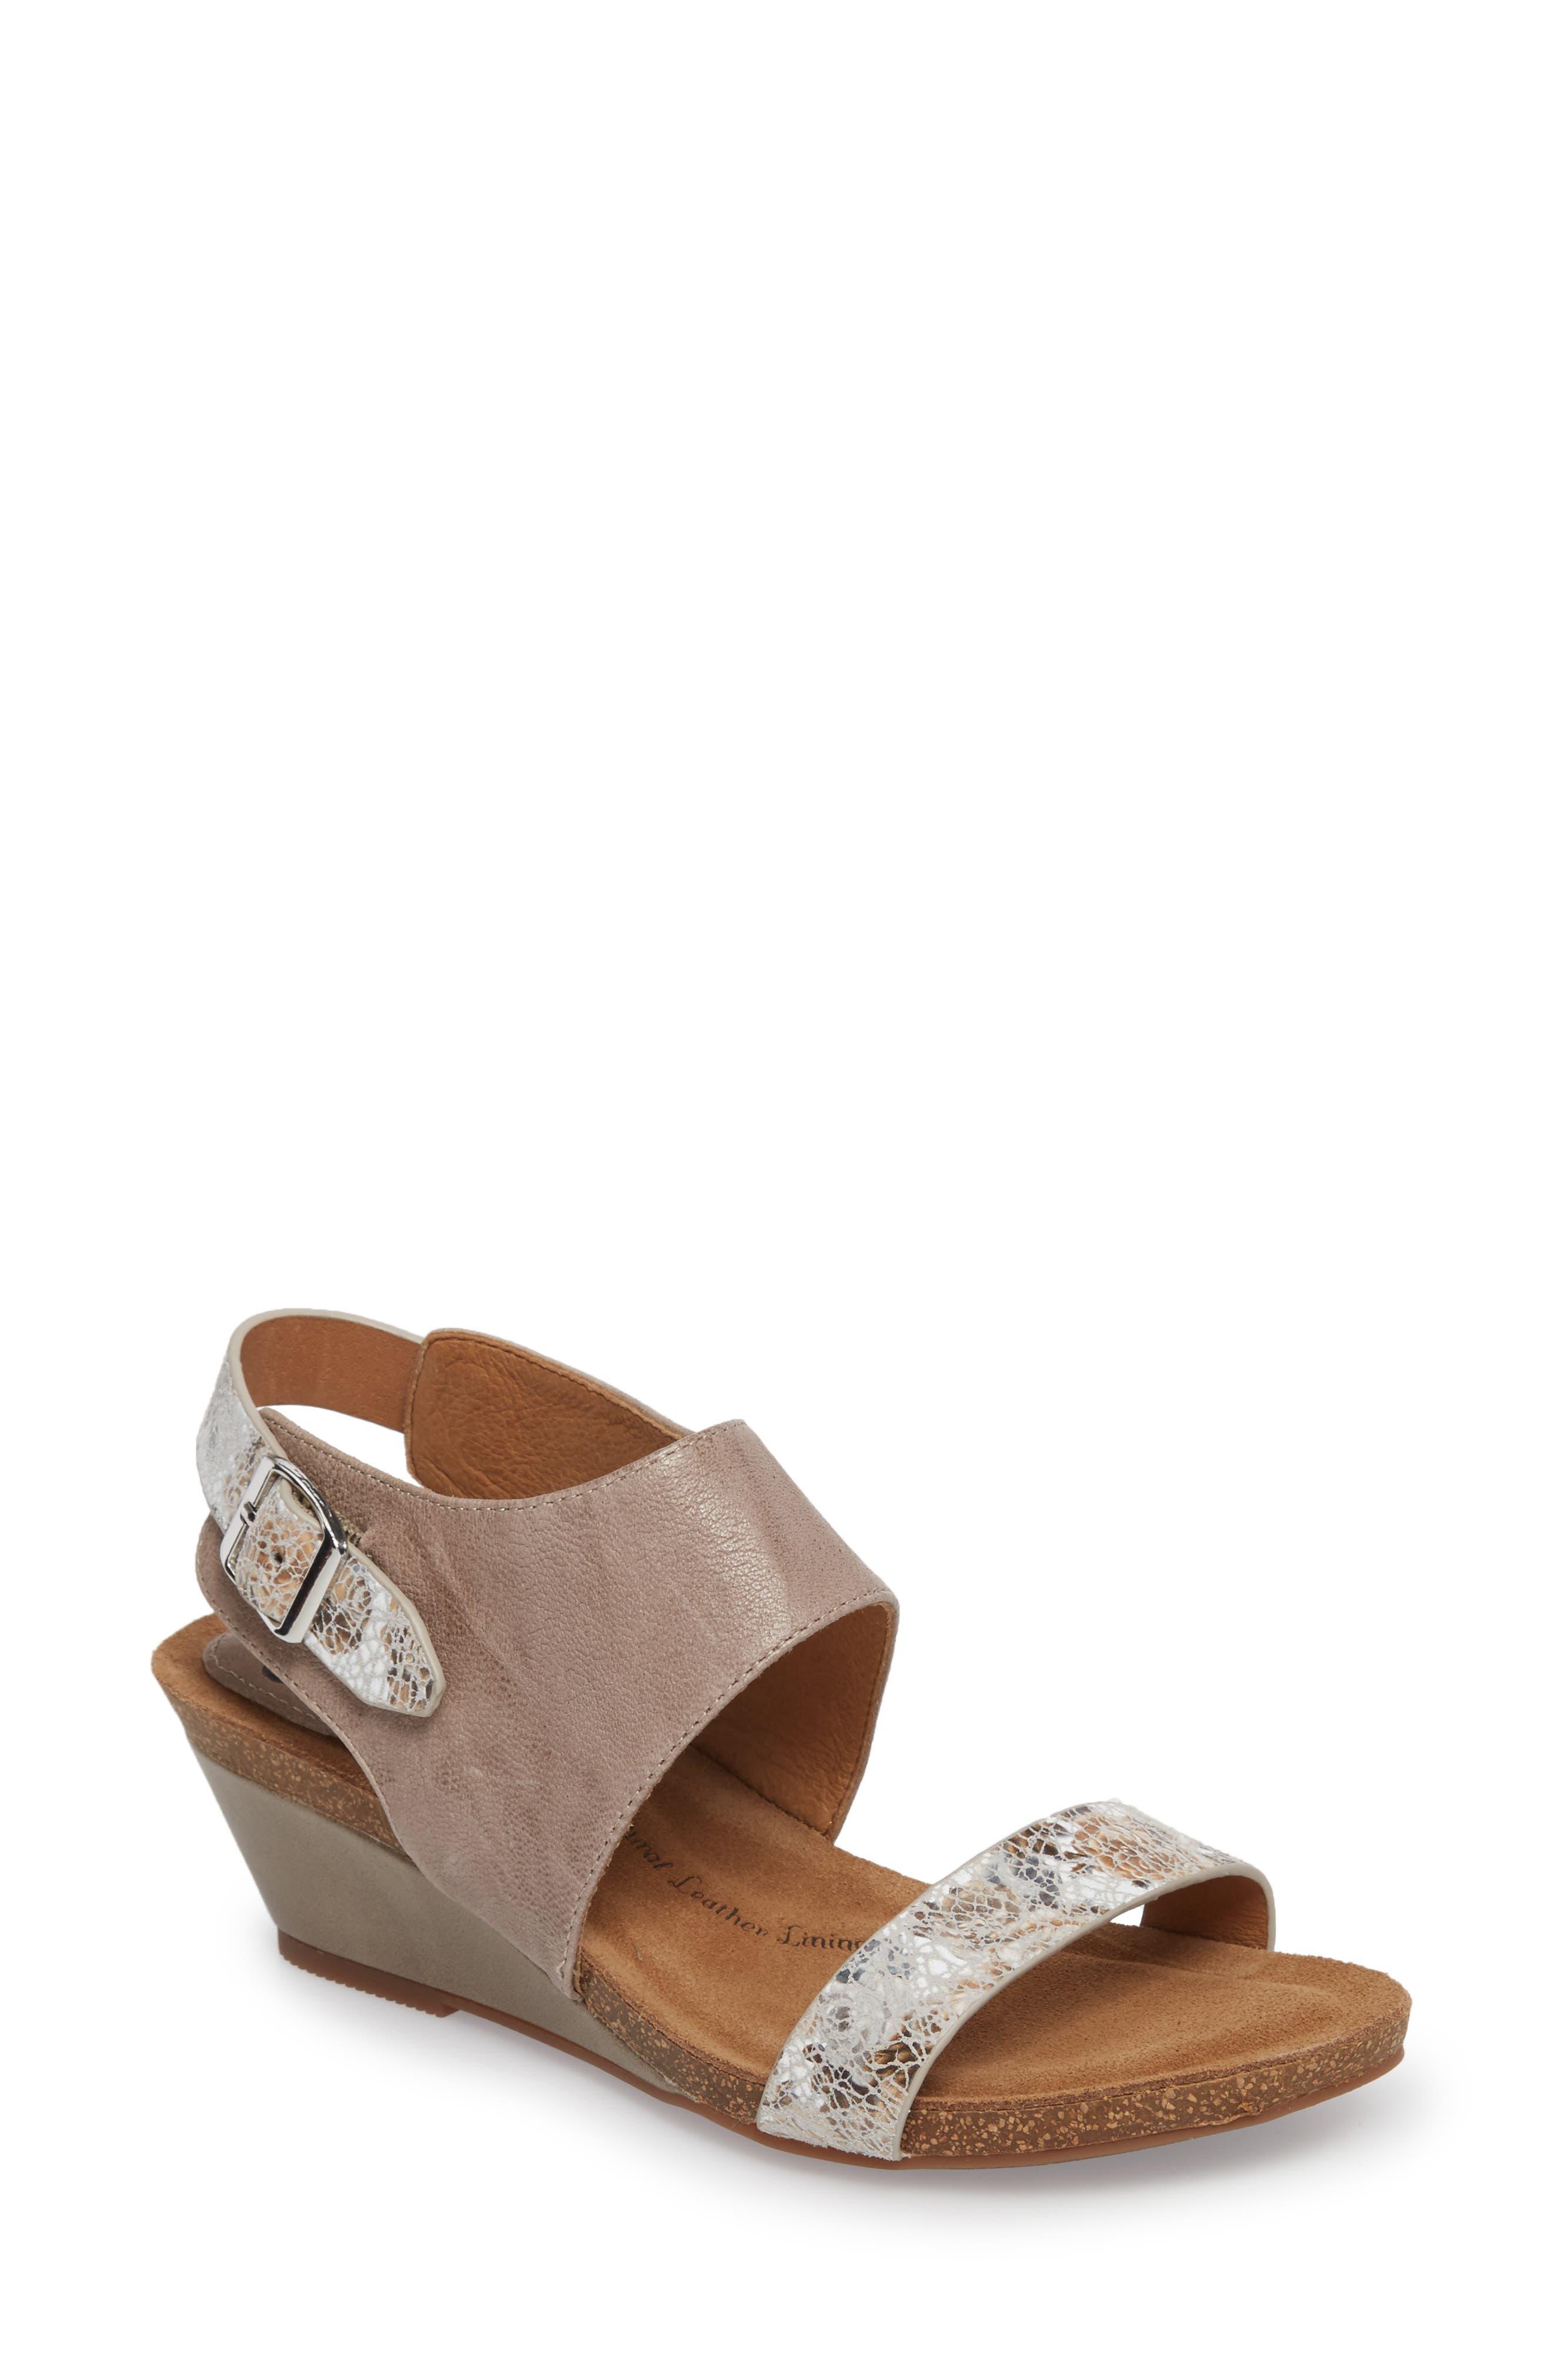 'Vanita' Leather Sandal,                             Main thumbnail 1, color,                             031